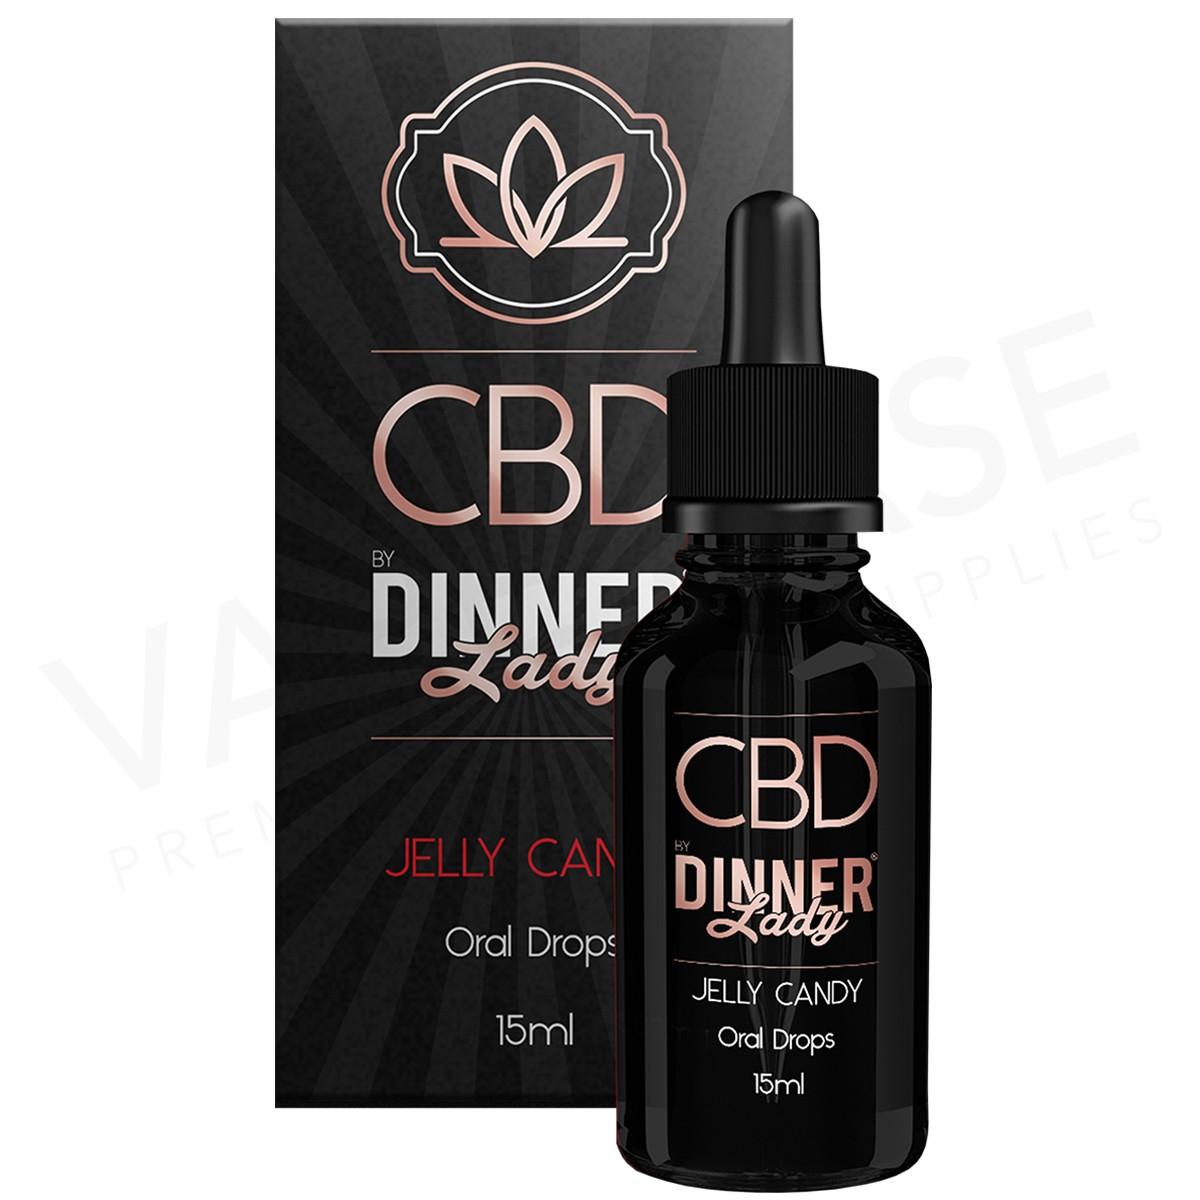 DINNER LADY - CBD DROPS JELLY CANDY (500mg)